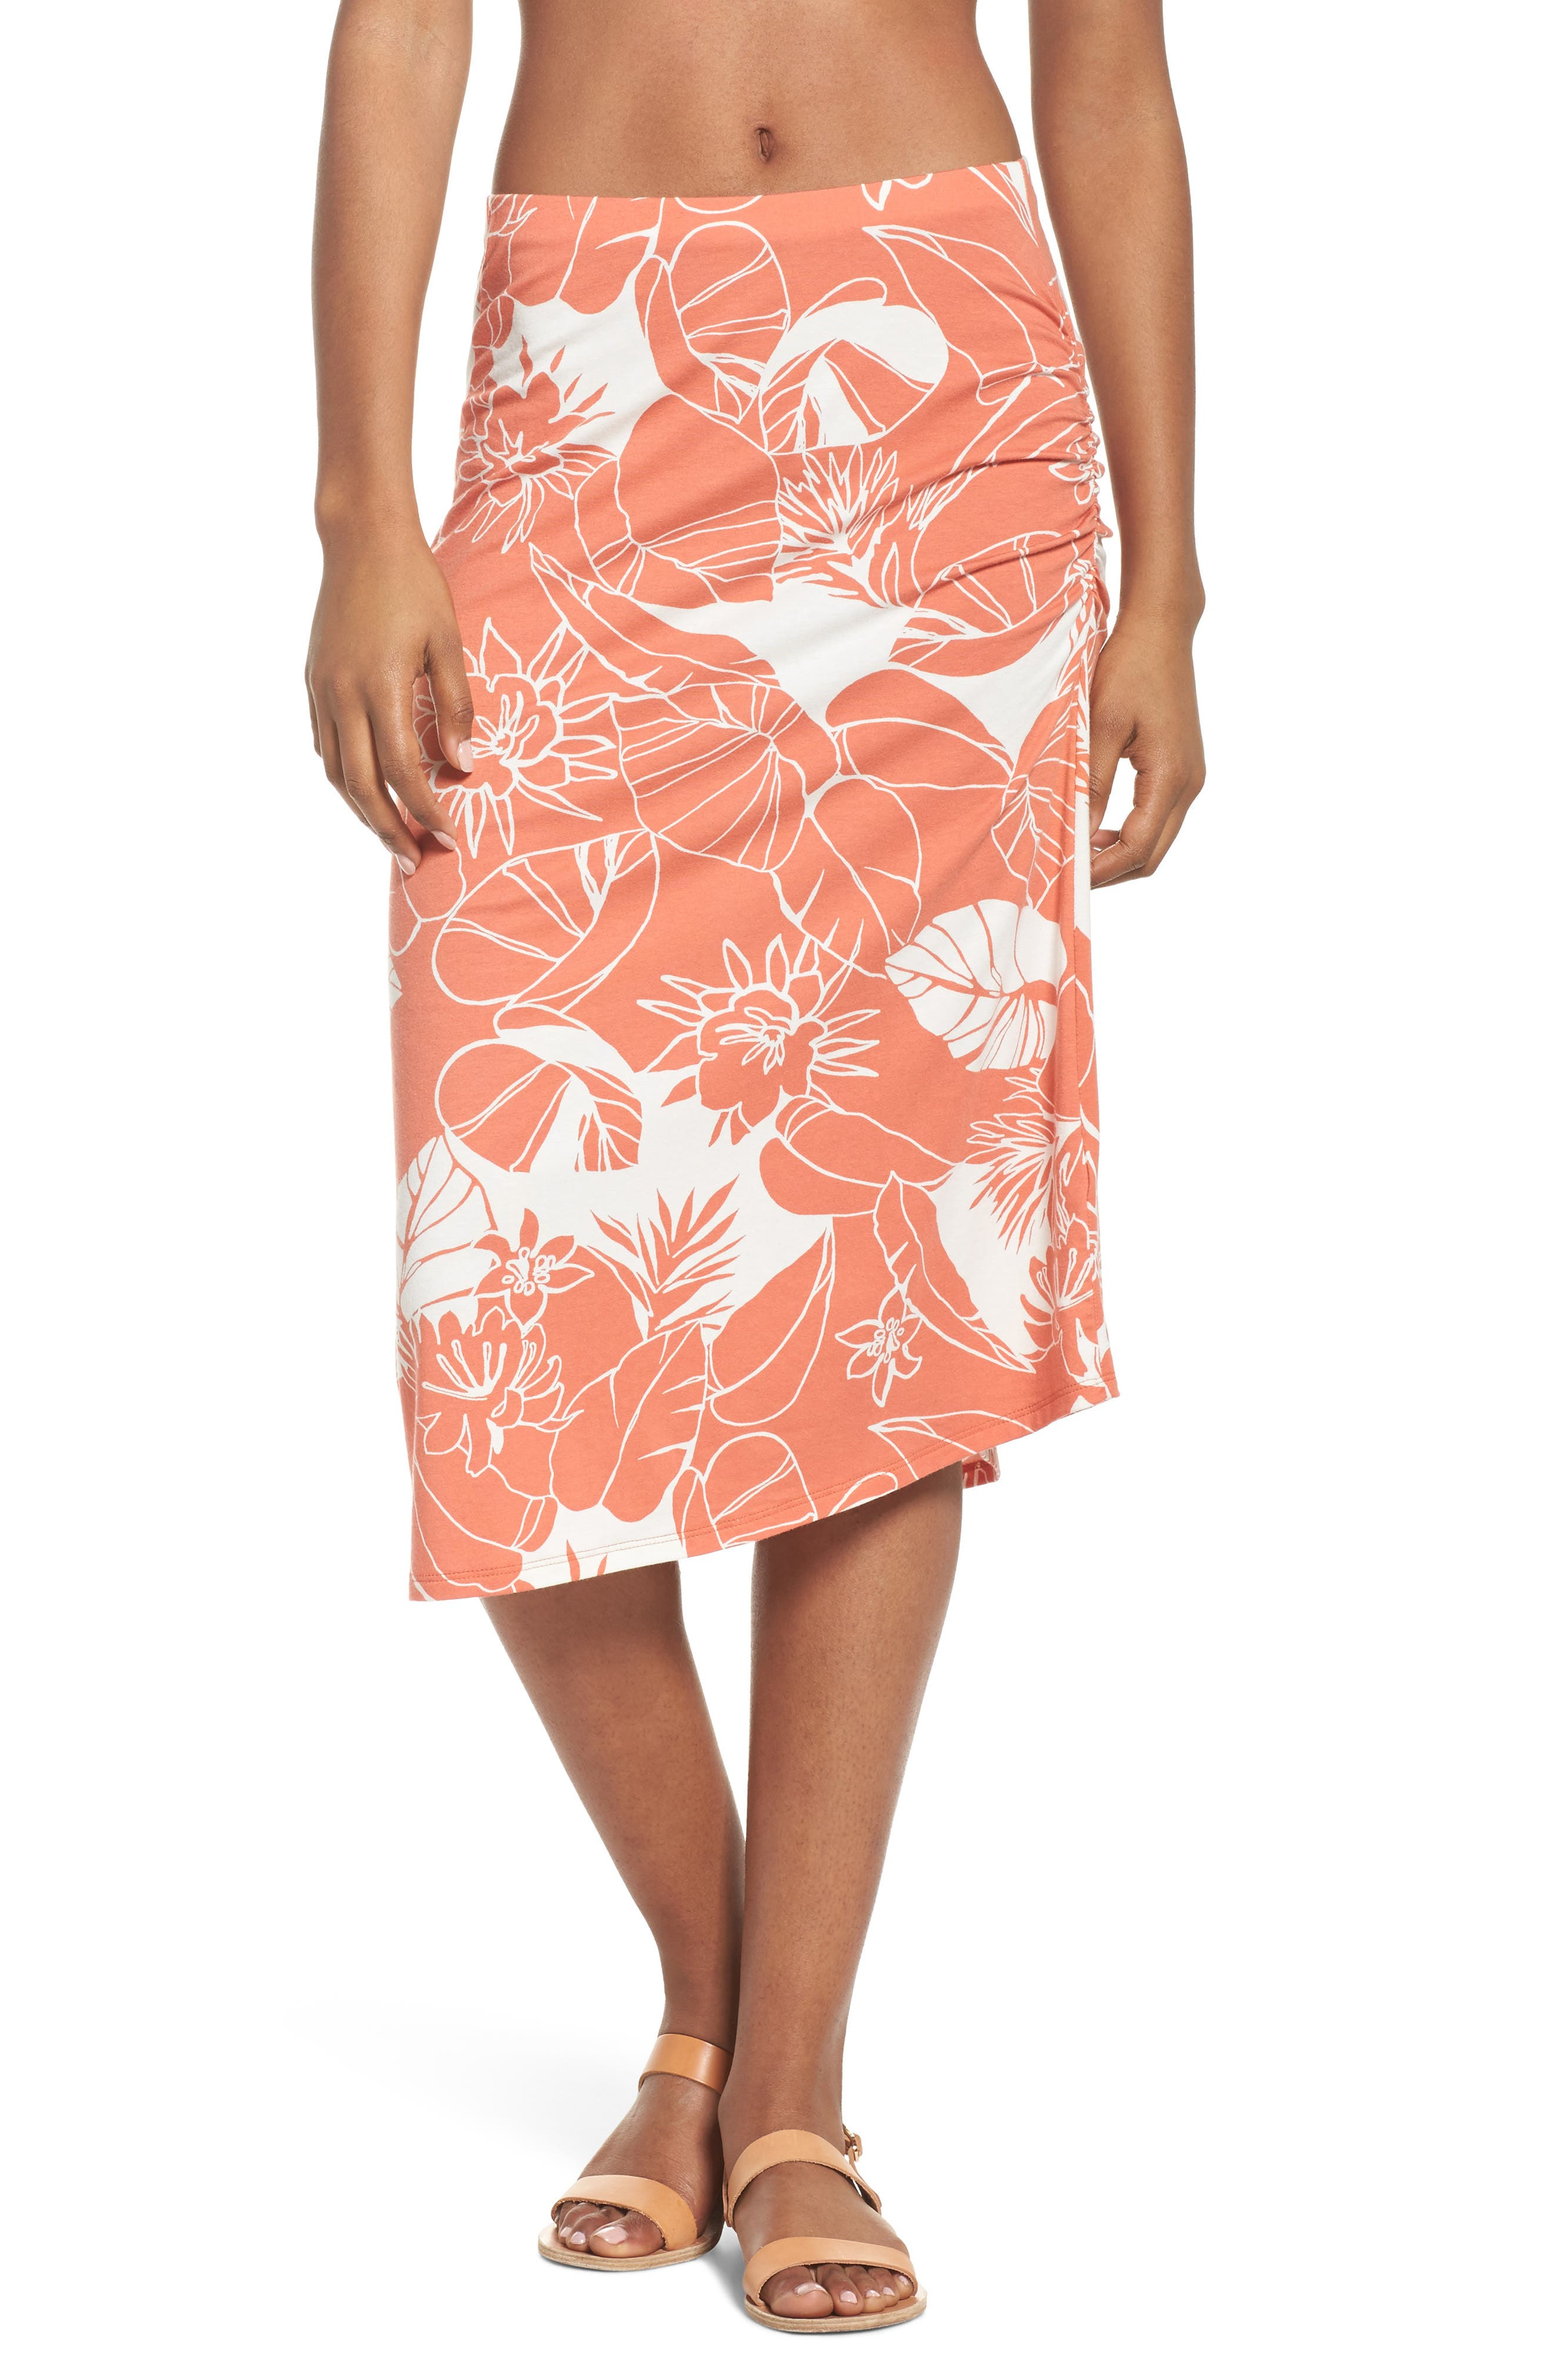 Dream Song Skirt,                         Main,                         color, Valley Flora Quartz Coral